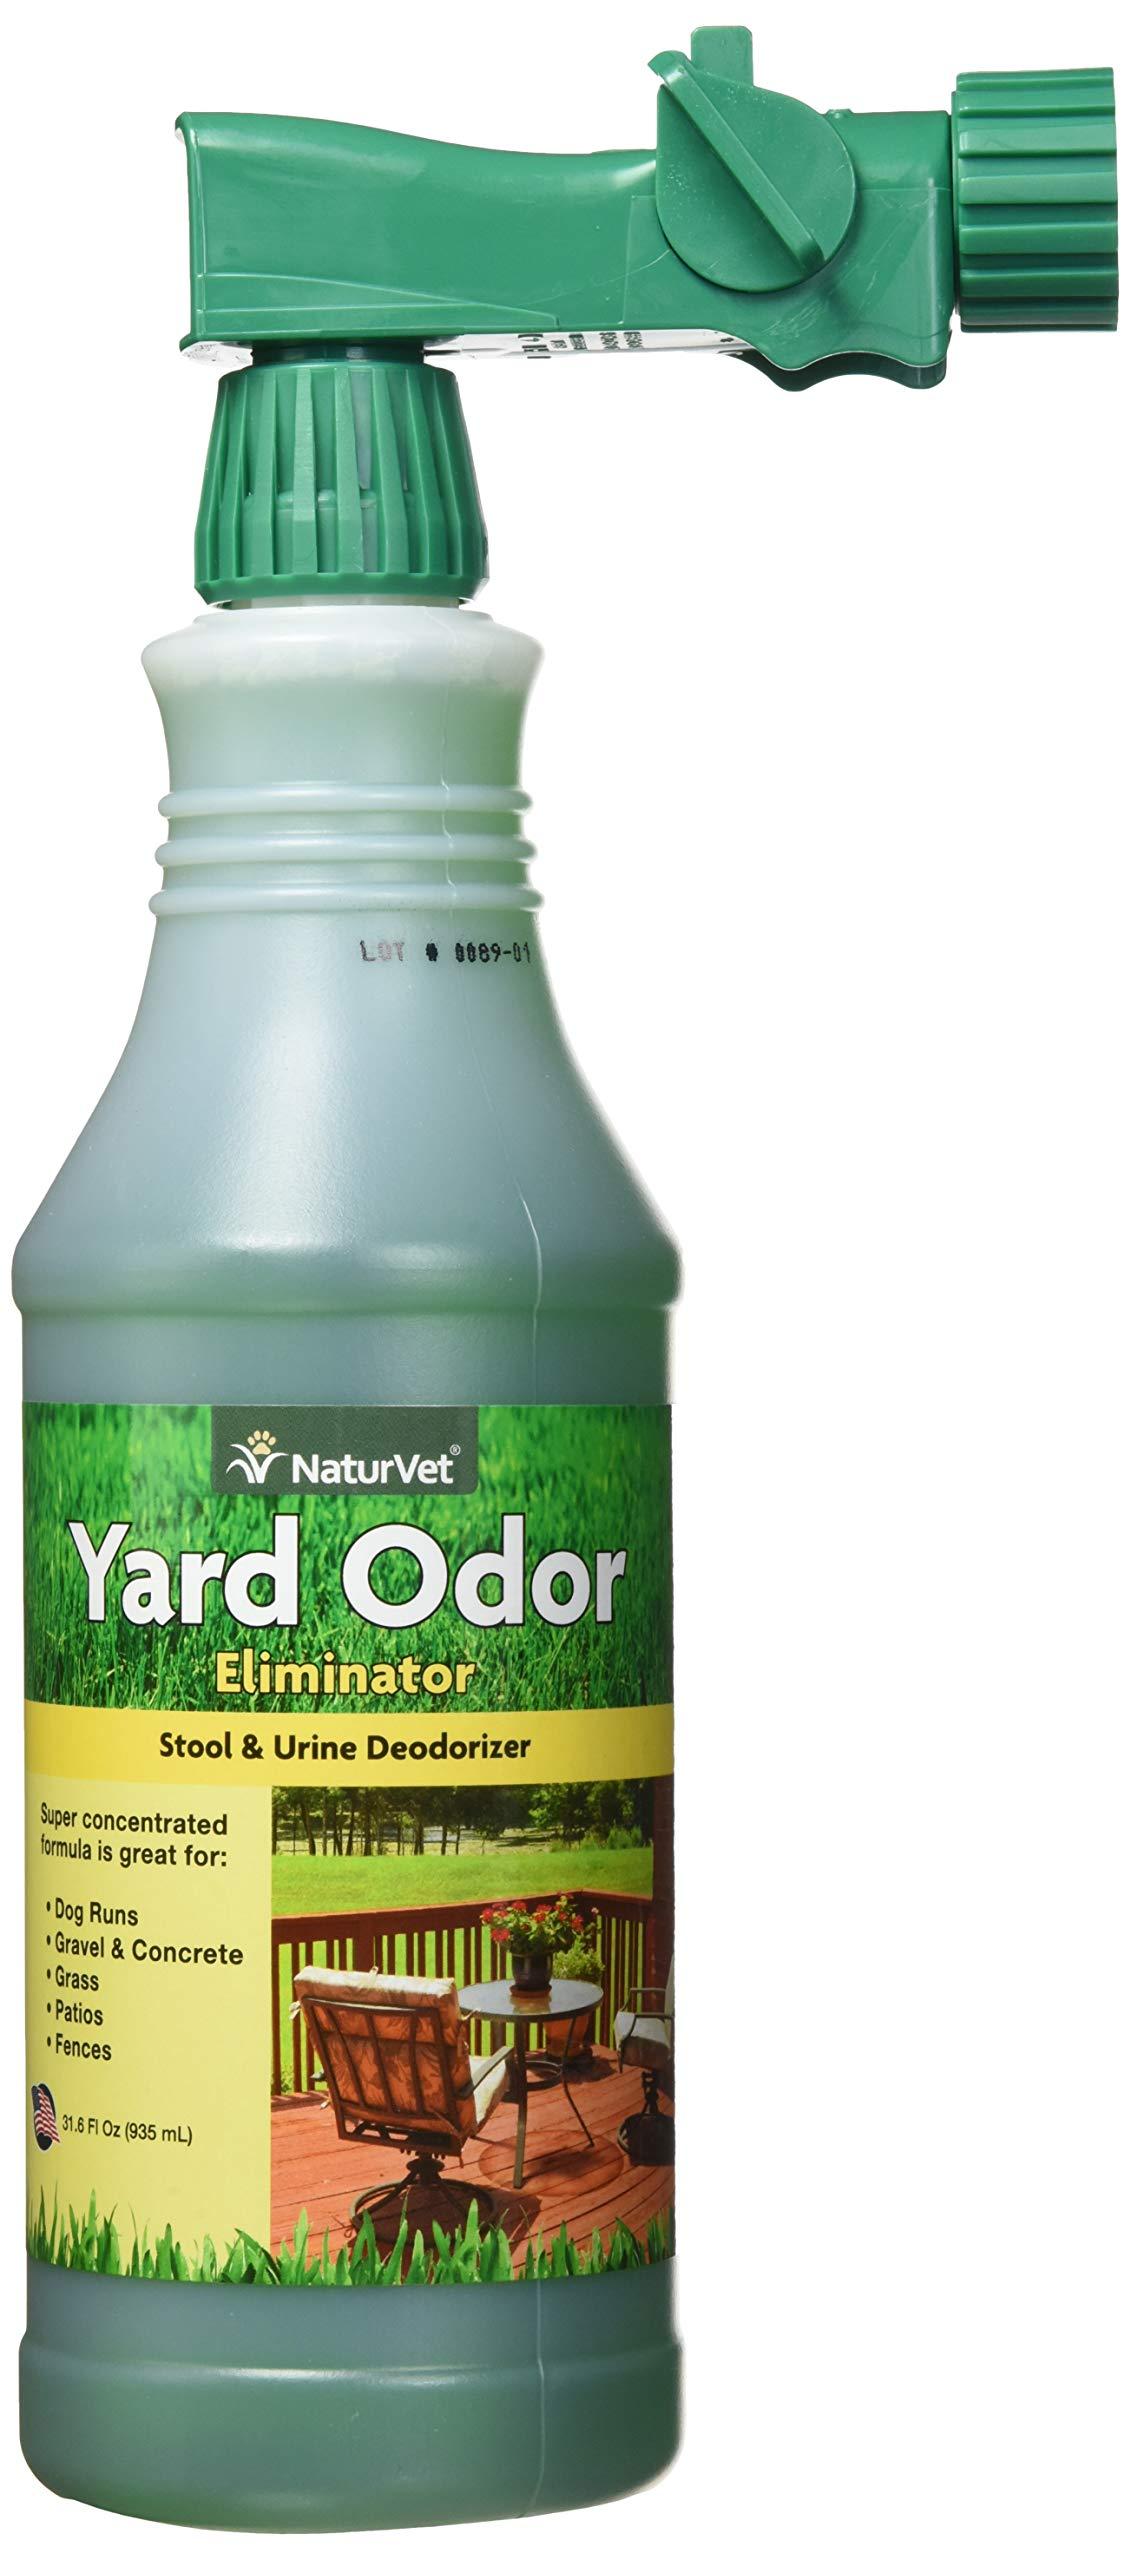 NaturVet Yard Odor Eliminator, Stool and Urine Deodorizer, Odor Eliminator, 32 fl oz Liquid, Made in the USA by NaturVet